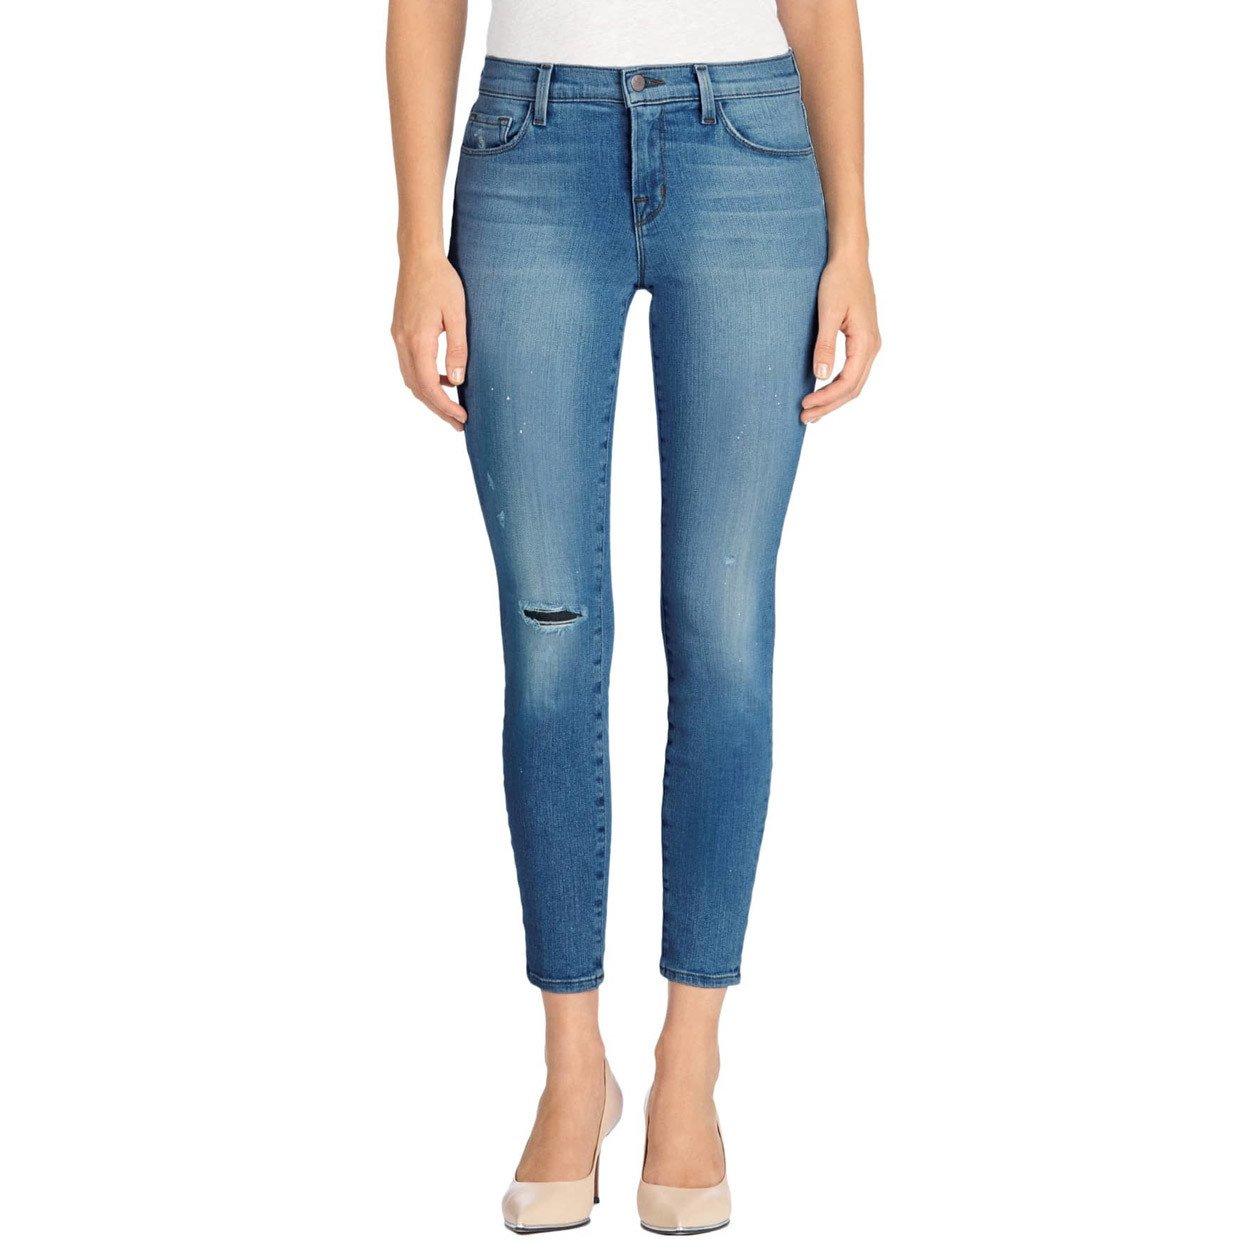 J Brand Jeans Women's 835 Mid-Rise Capri Collision Jeans (30, COLLISION) by J Brand Jeans